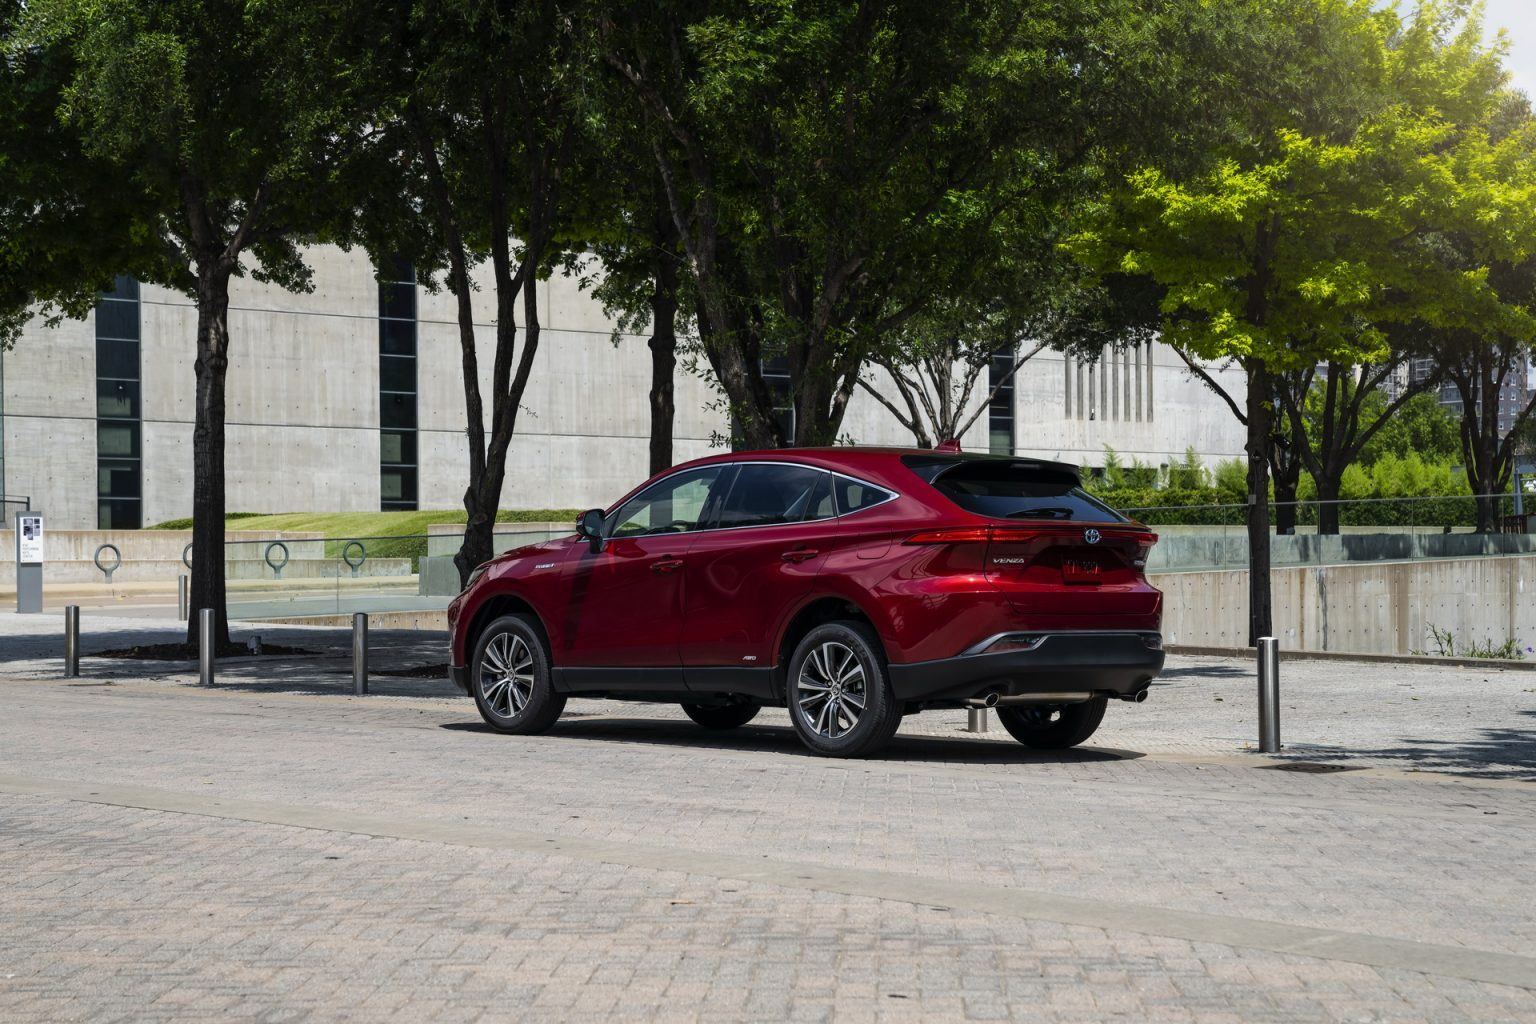 The ford bronco, chevrolet trailblazer,. أسعار تويوتا فينزا 2021 الجديدة كلي ا موتوراتي